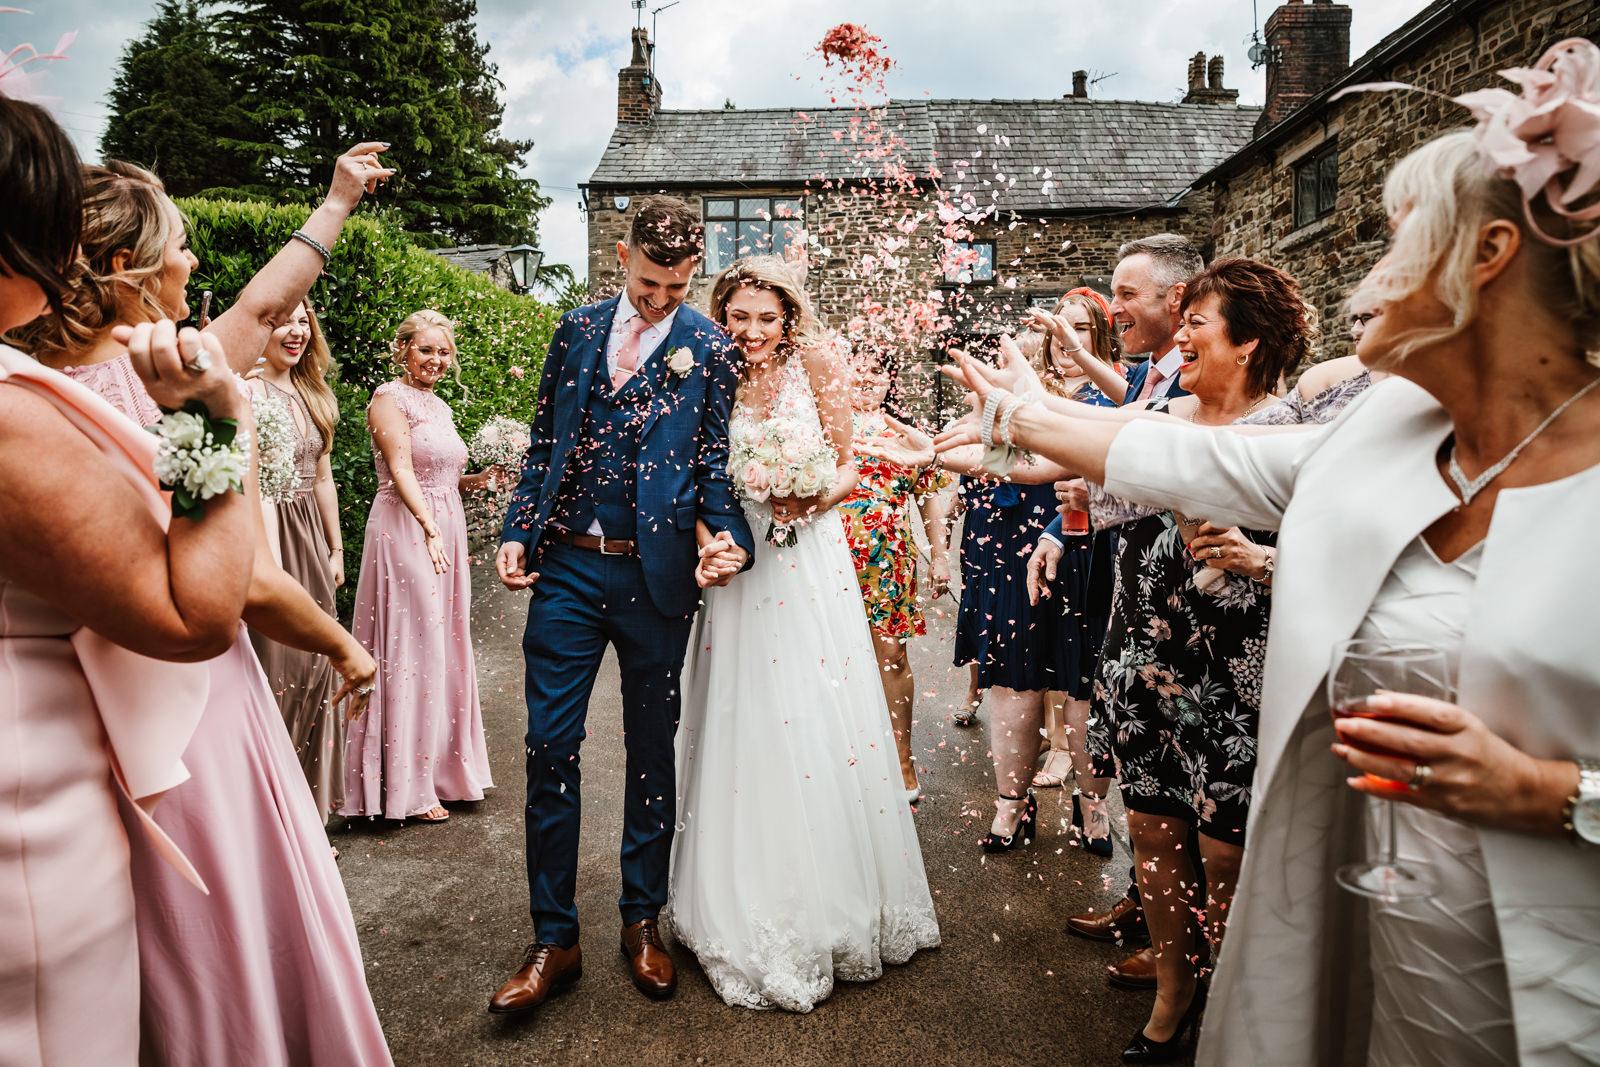 weddings at hyde bank farm